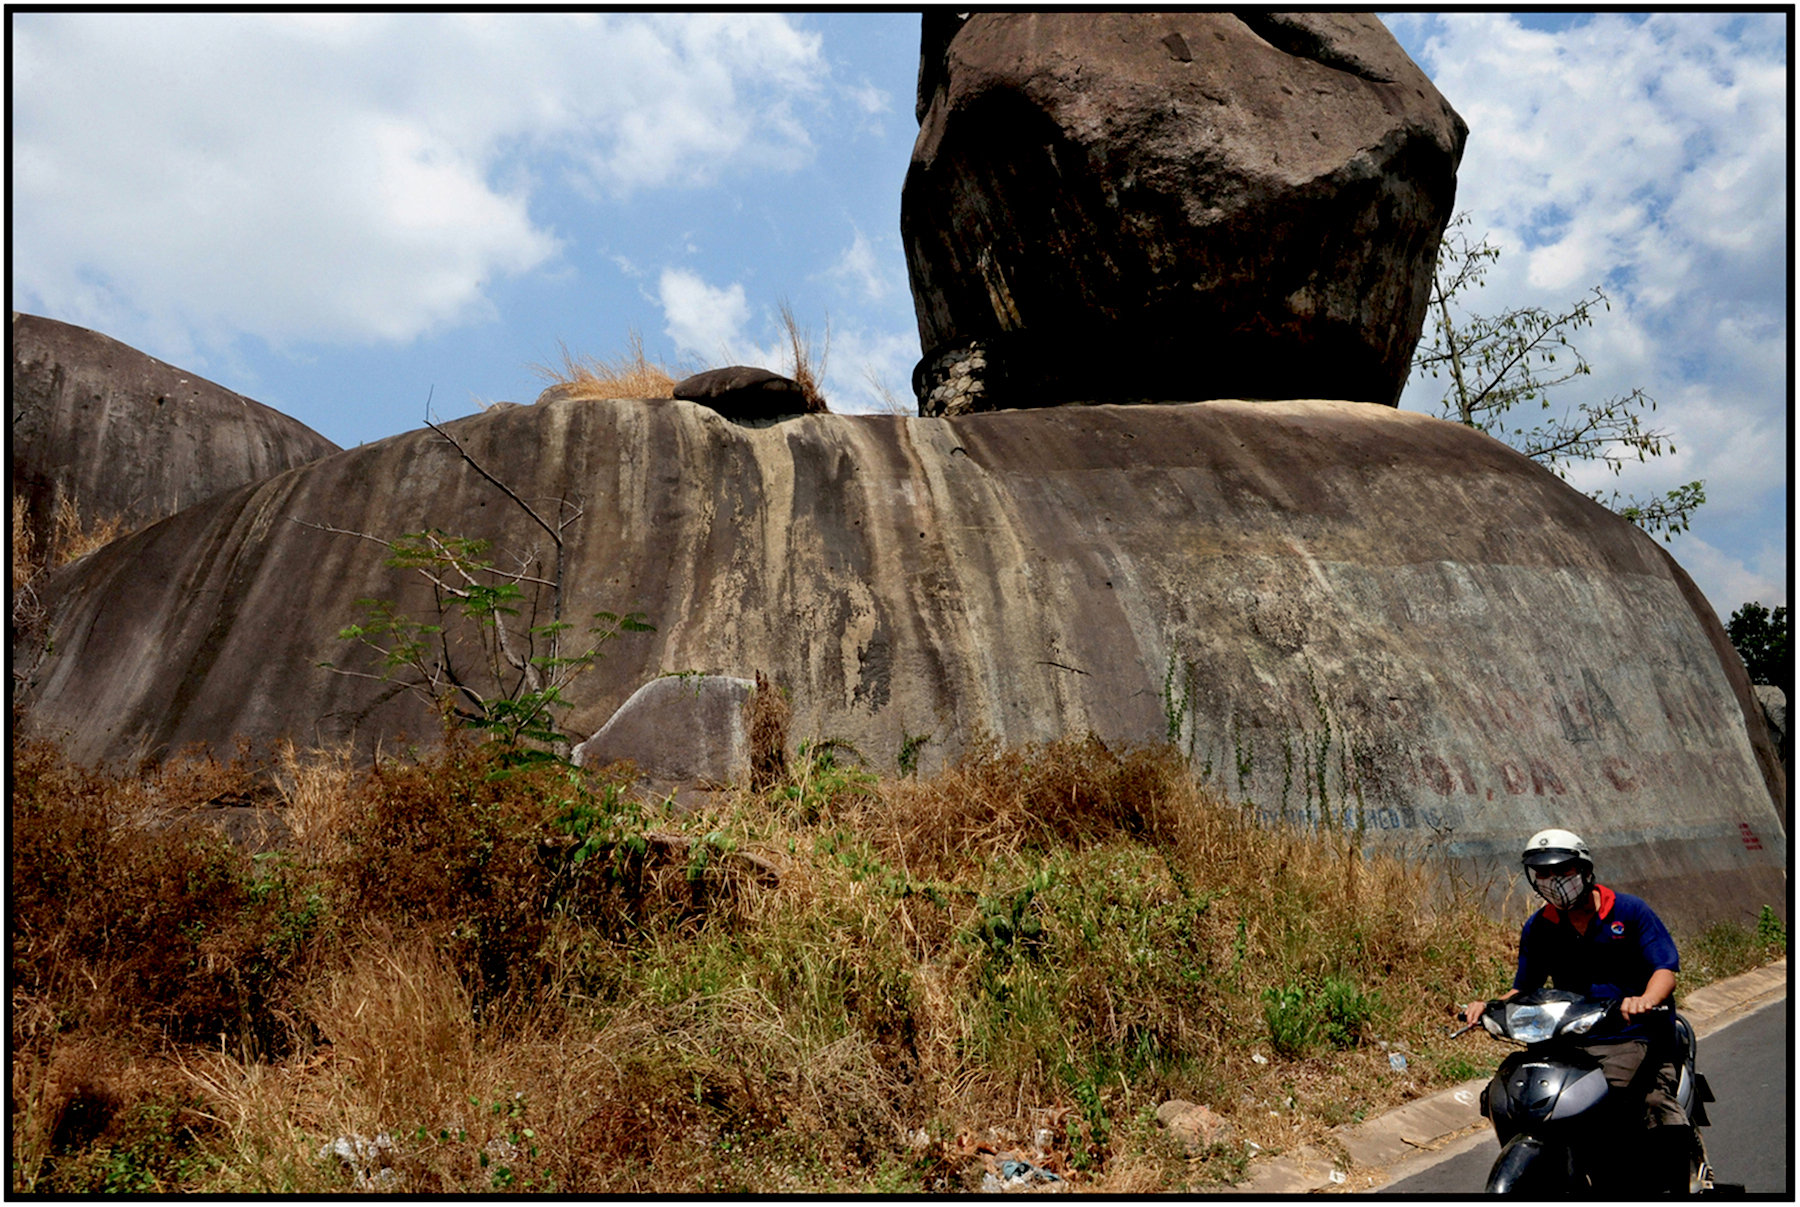 Rock formations on highway north of Saigon/HCMC, Mar. 2015. #1072